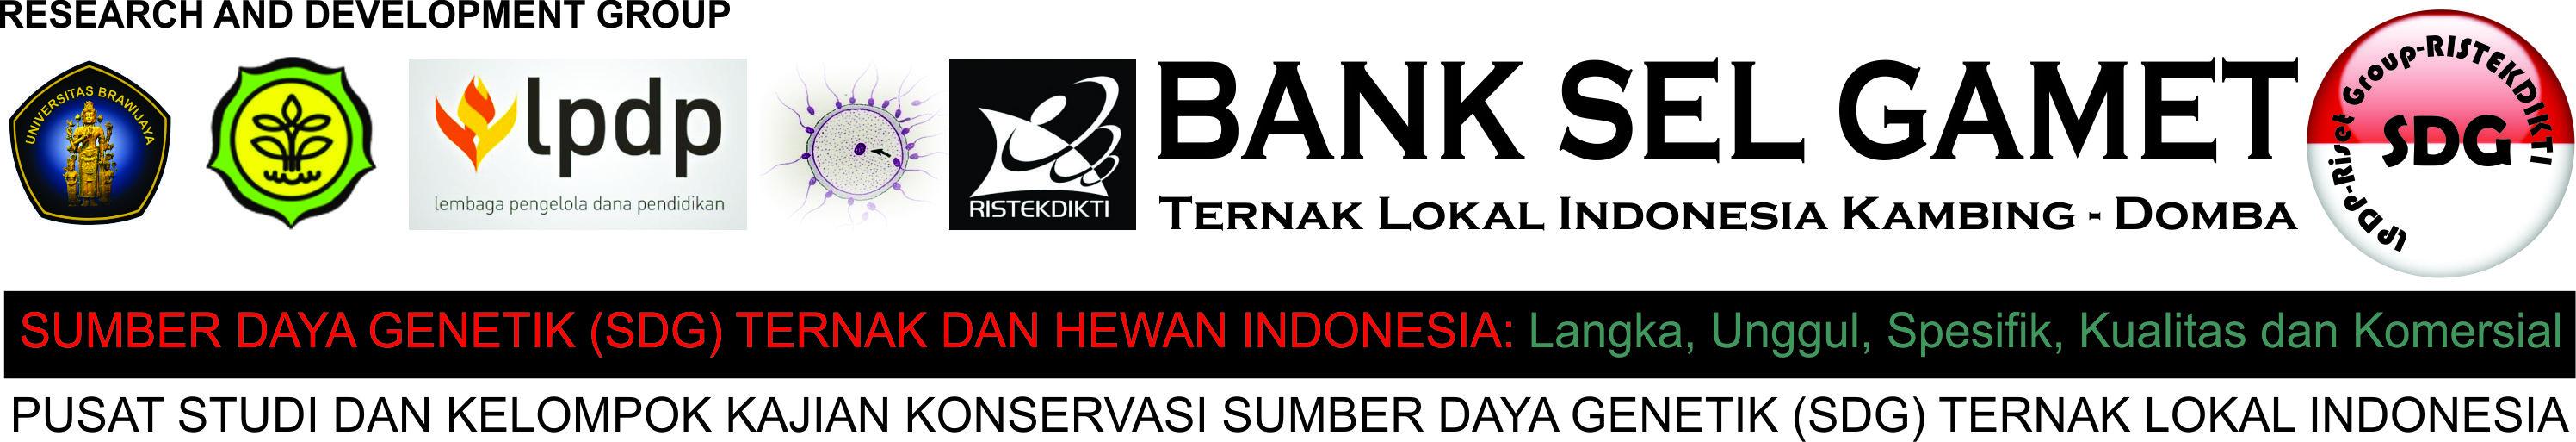 Bank Sel Gamet Ternak Lokal Indonesia Kambong Domba Logo